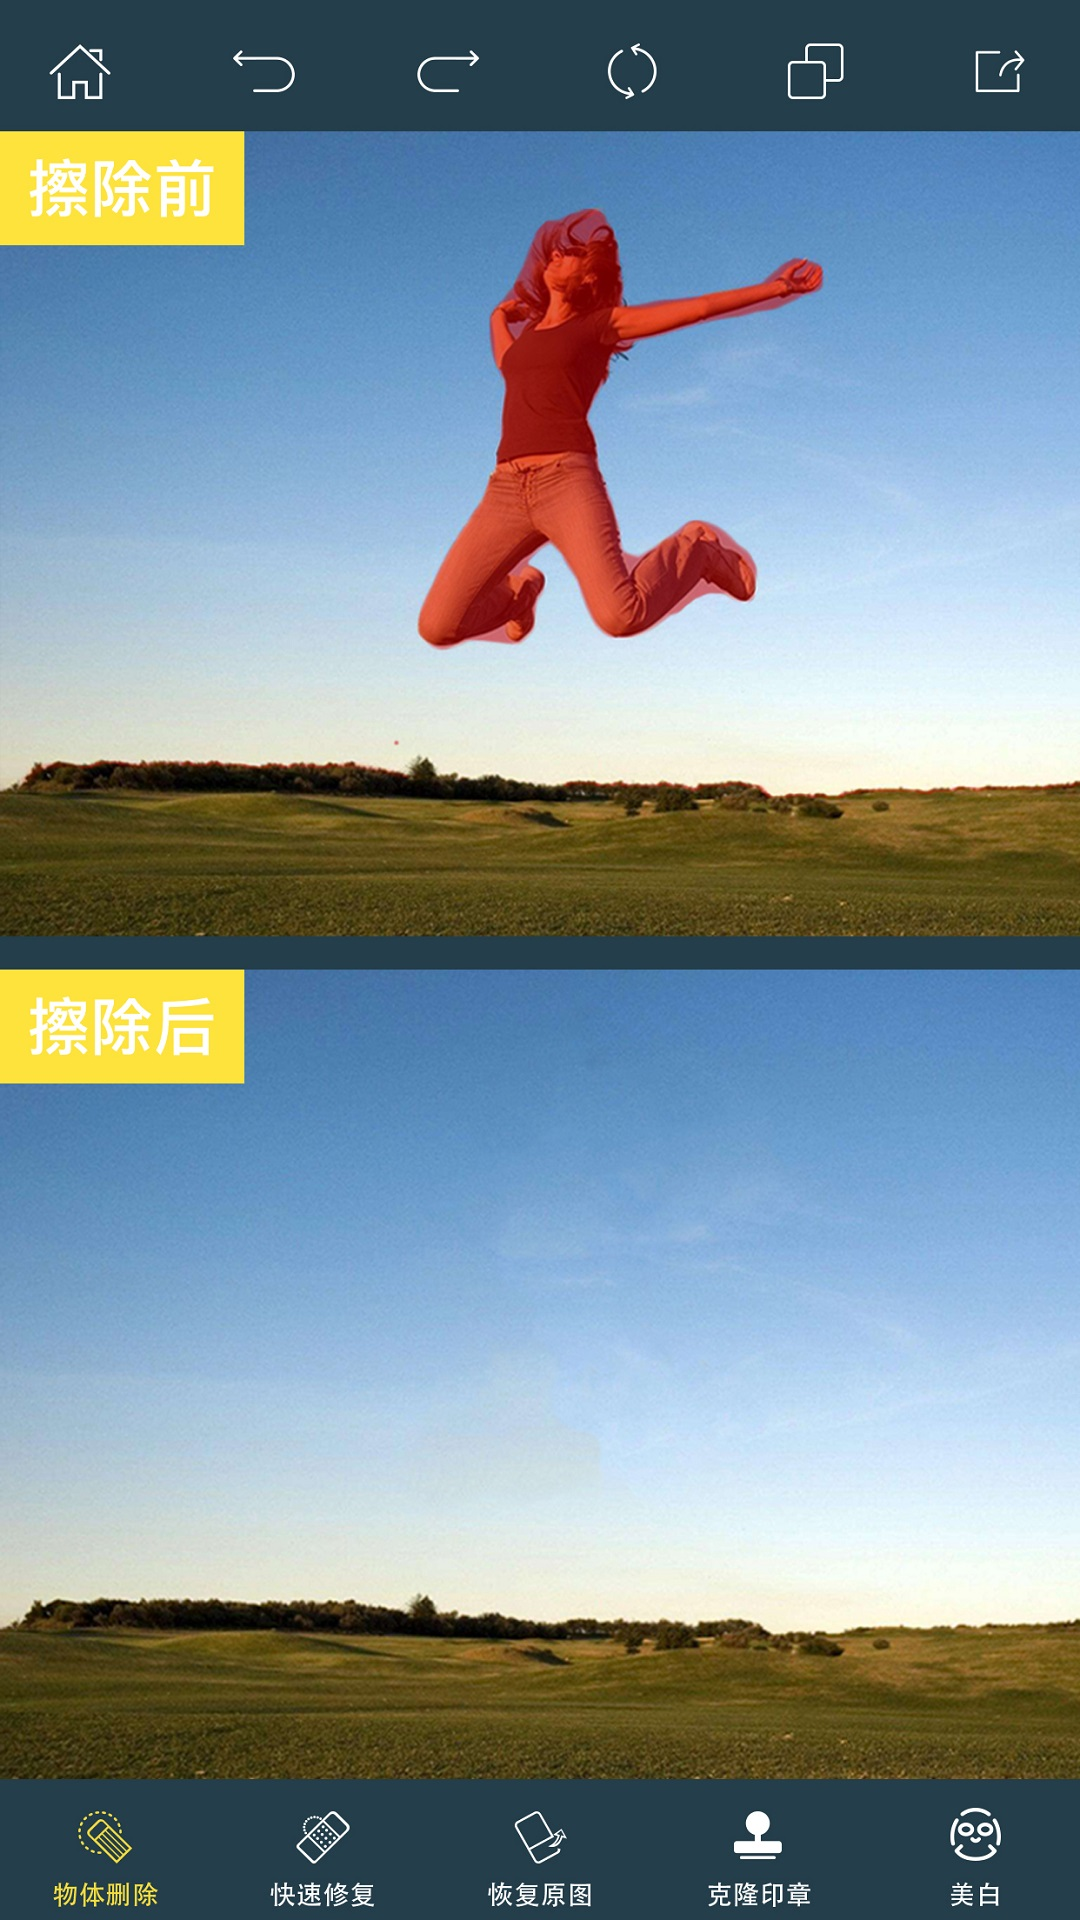 PhotoRetouch(照片修复软件) V2.4 安卓官方版截图5